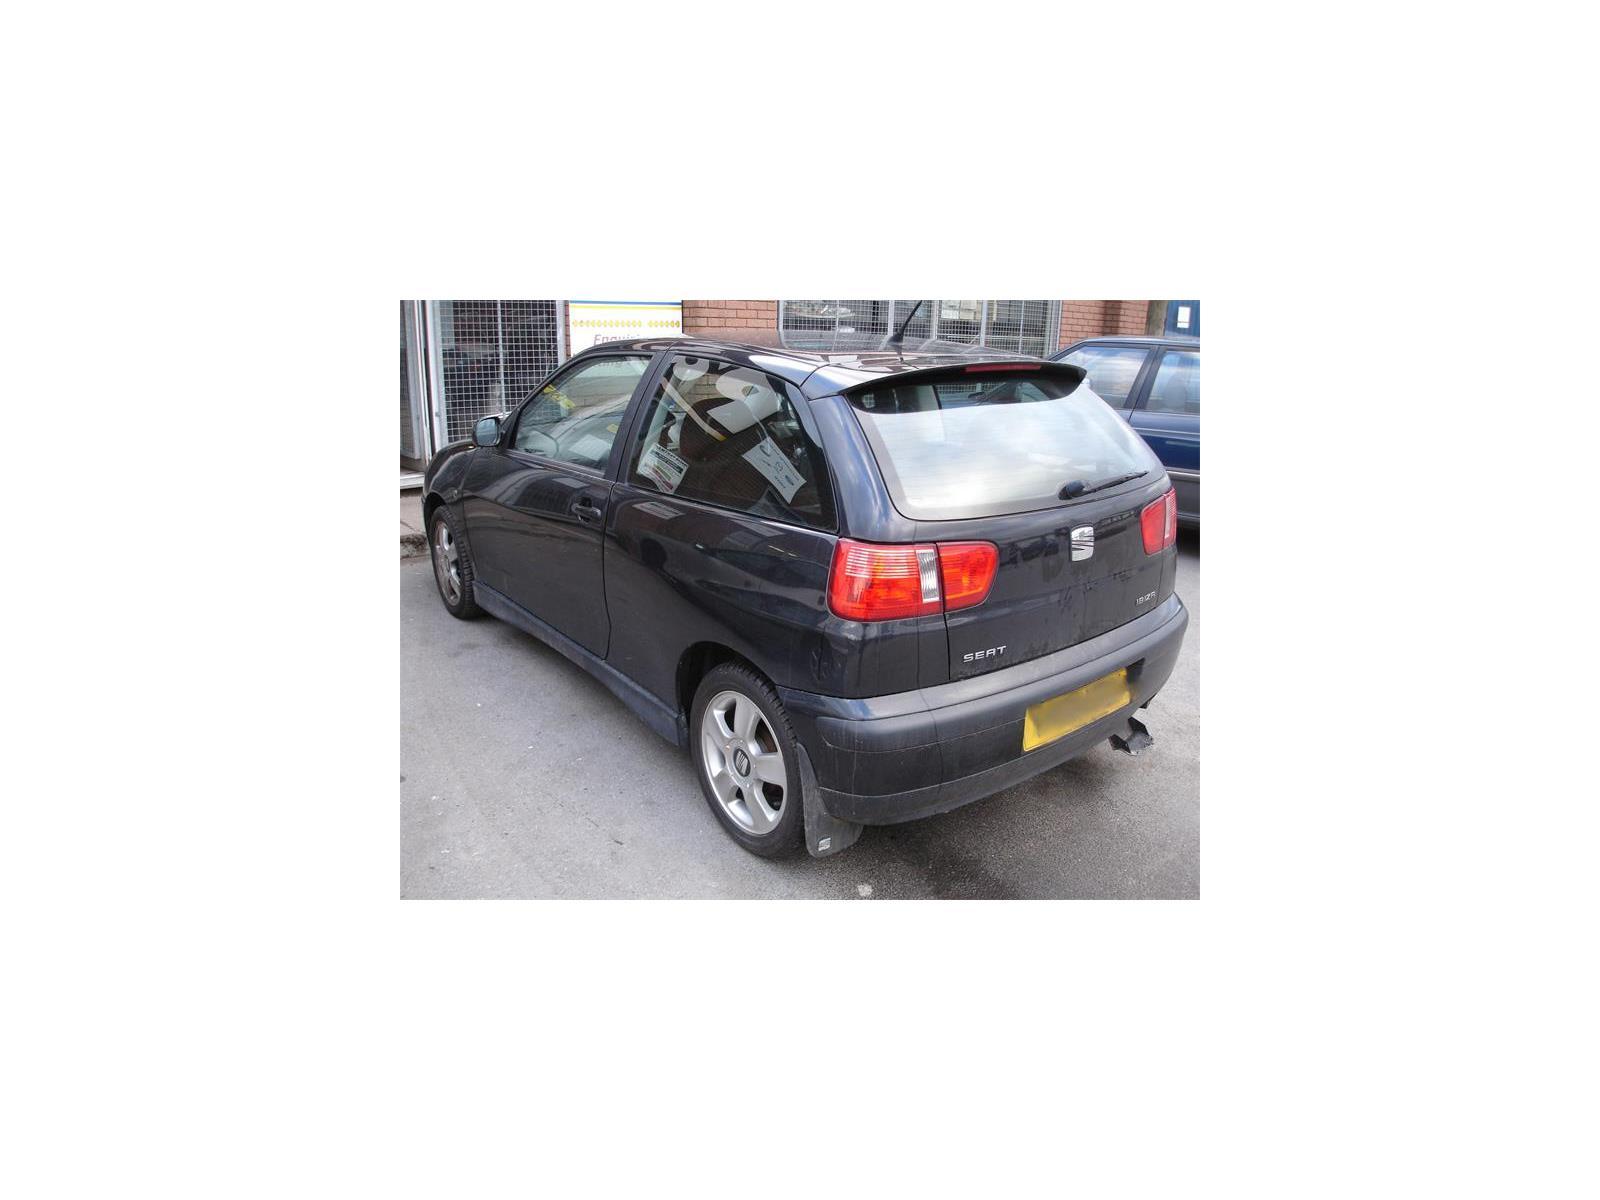 2001 seat ibiza 1999 to 2002 3 door hatchback petrol manual rh partmart co uk 1999 Seat Ibiza Rally Seat Ibiza 2002